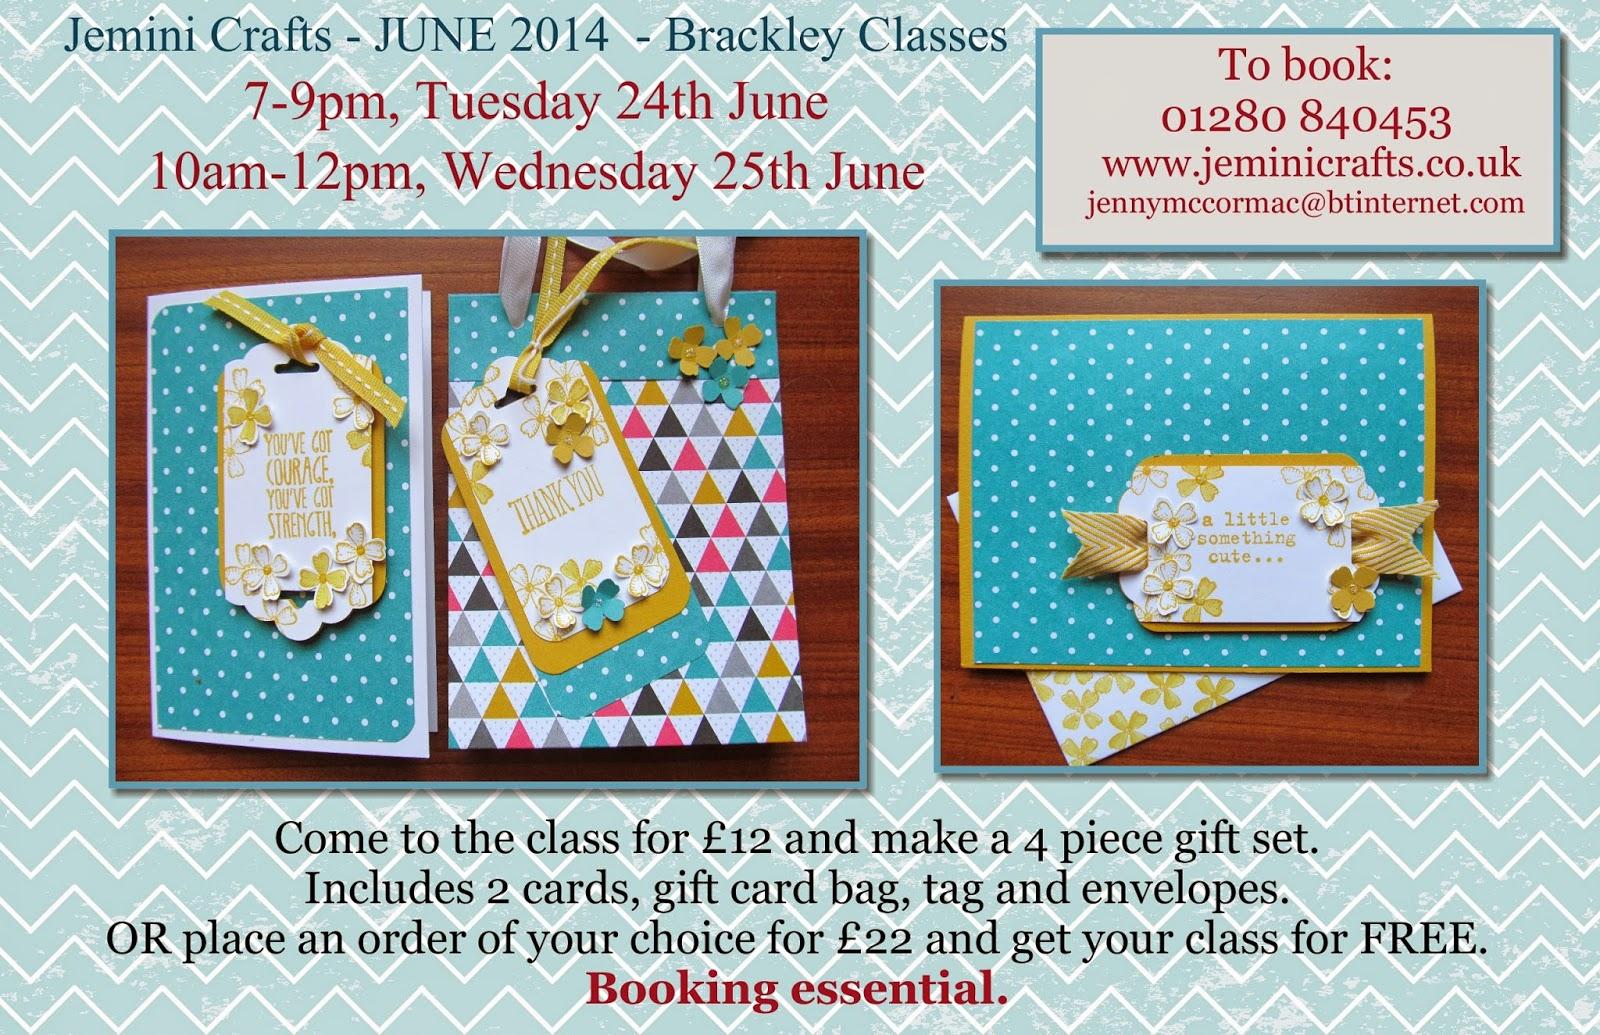 Card class Brackley June 2014 jeminicrafts.co.uk